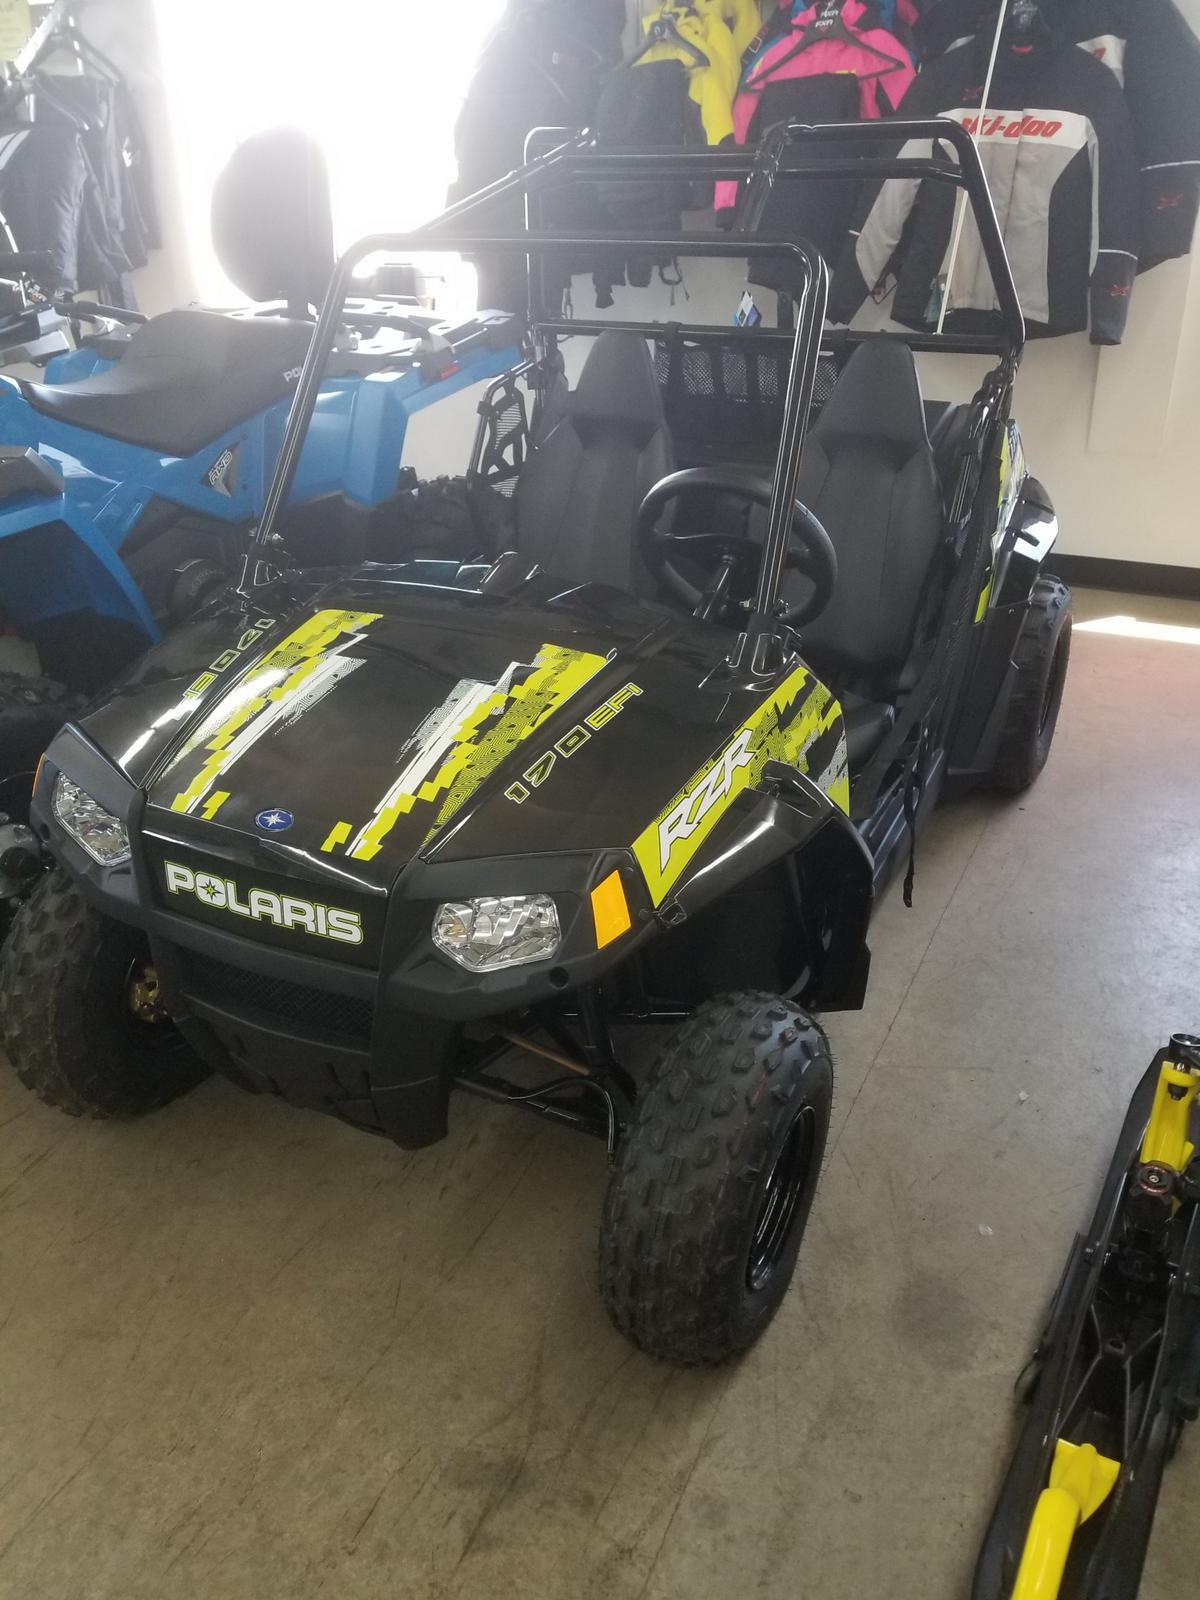 2019 Polaris Industries RZR® 170 EFI - Lime Squeeze/Cruiser Black